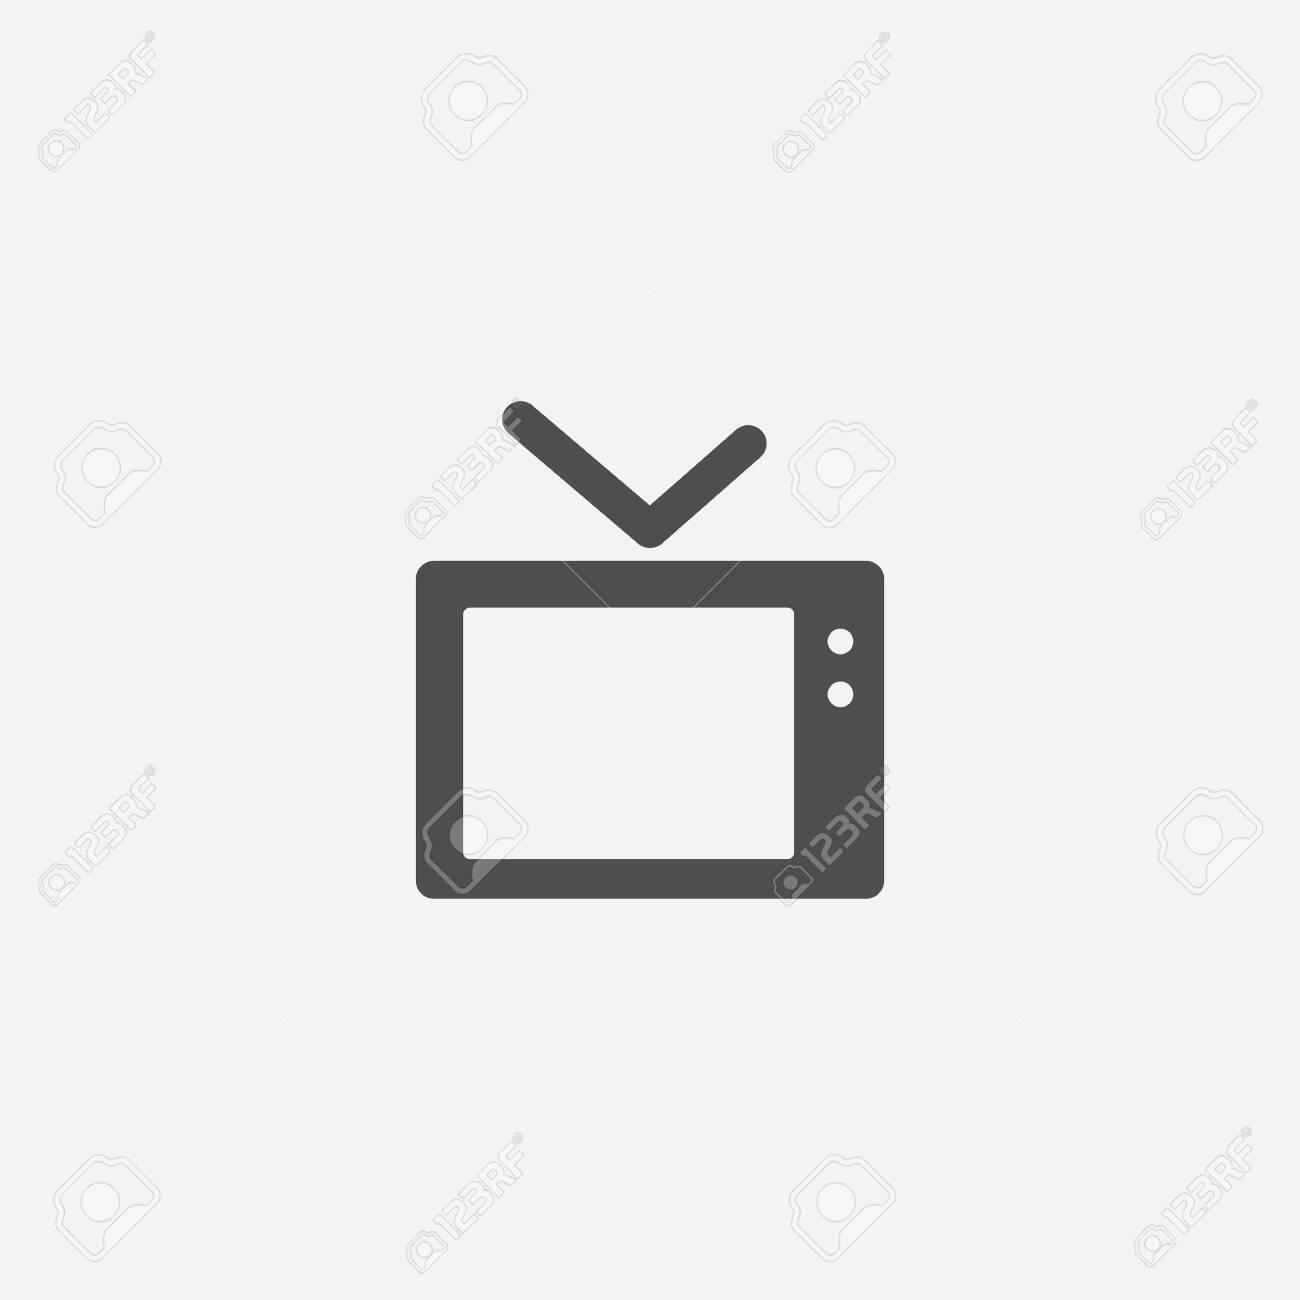 tv icon - 143059542